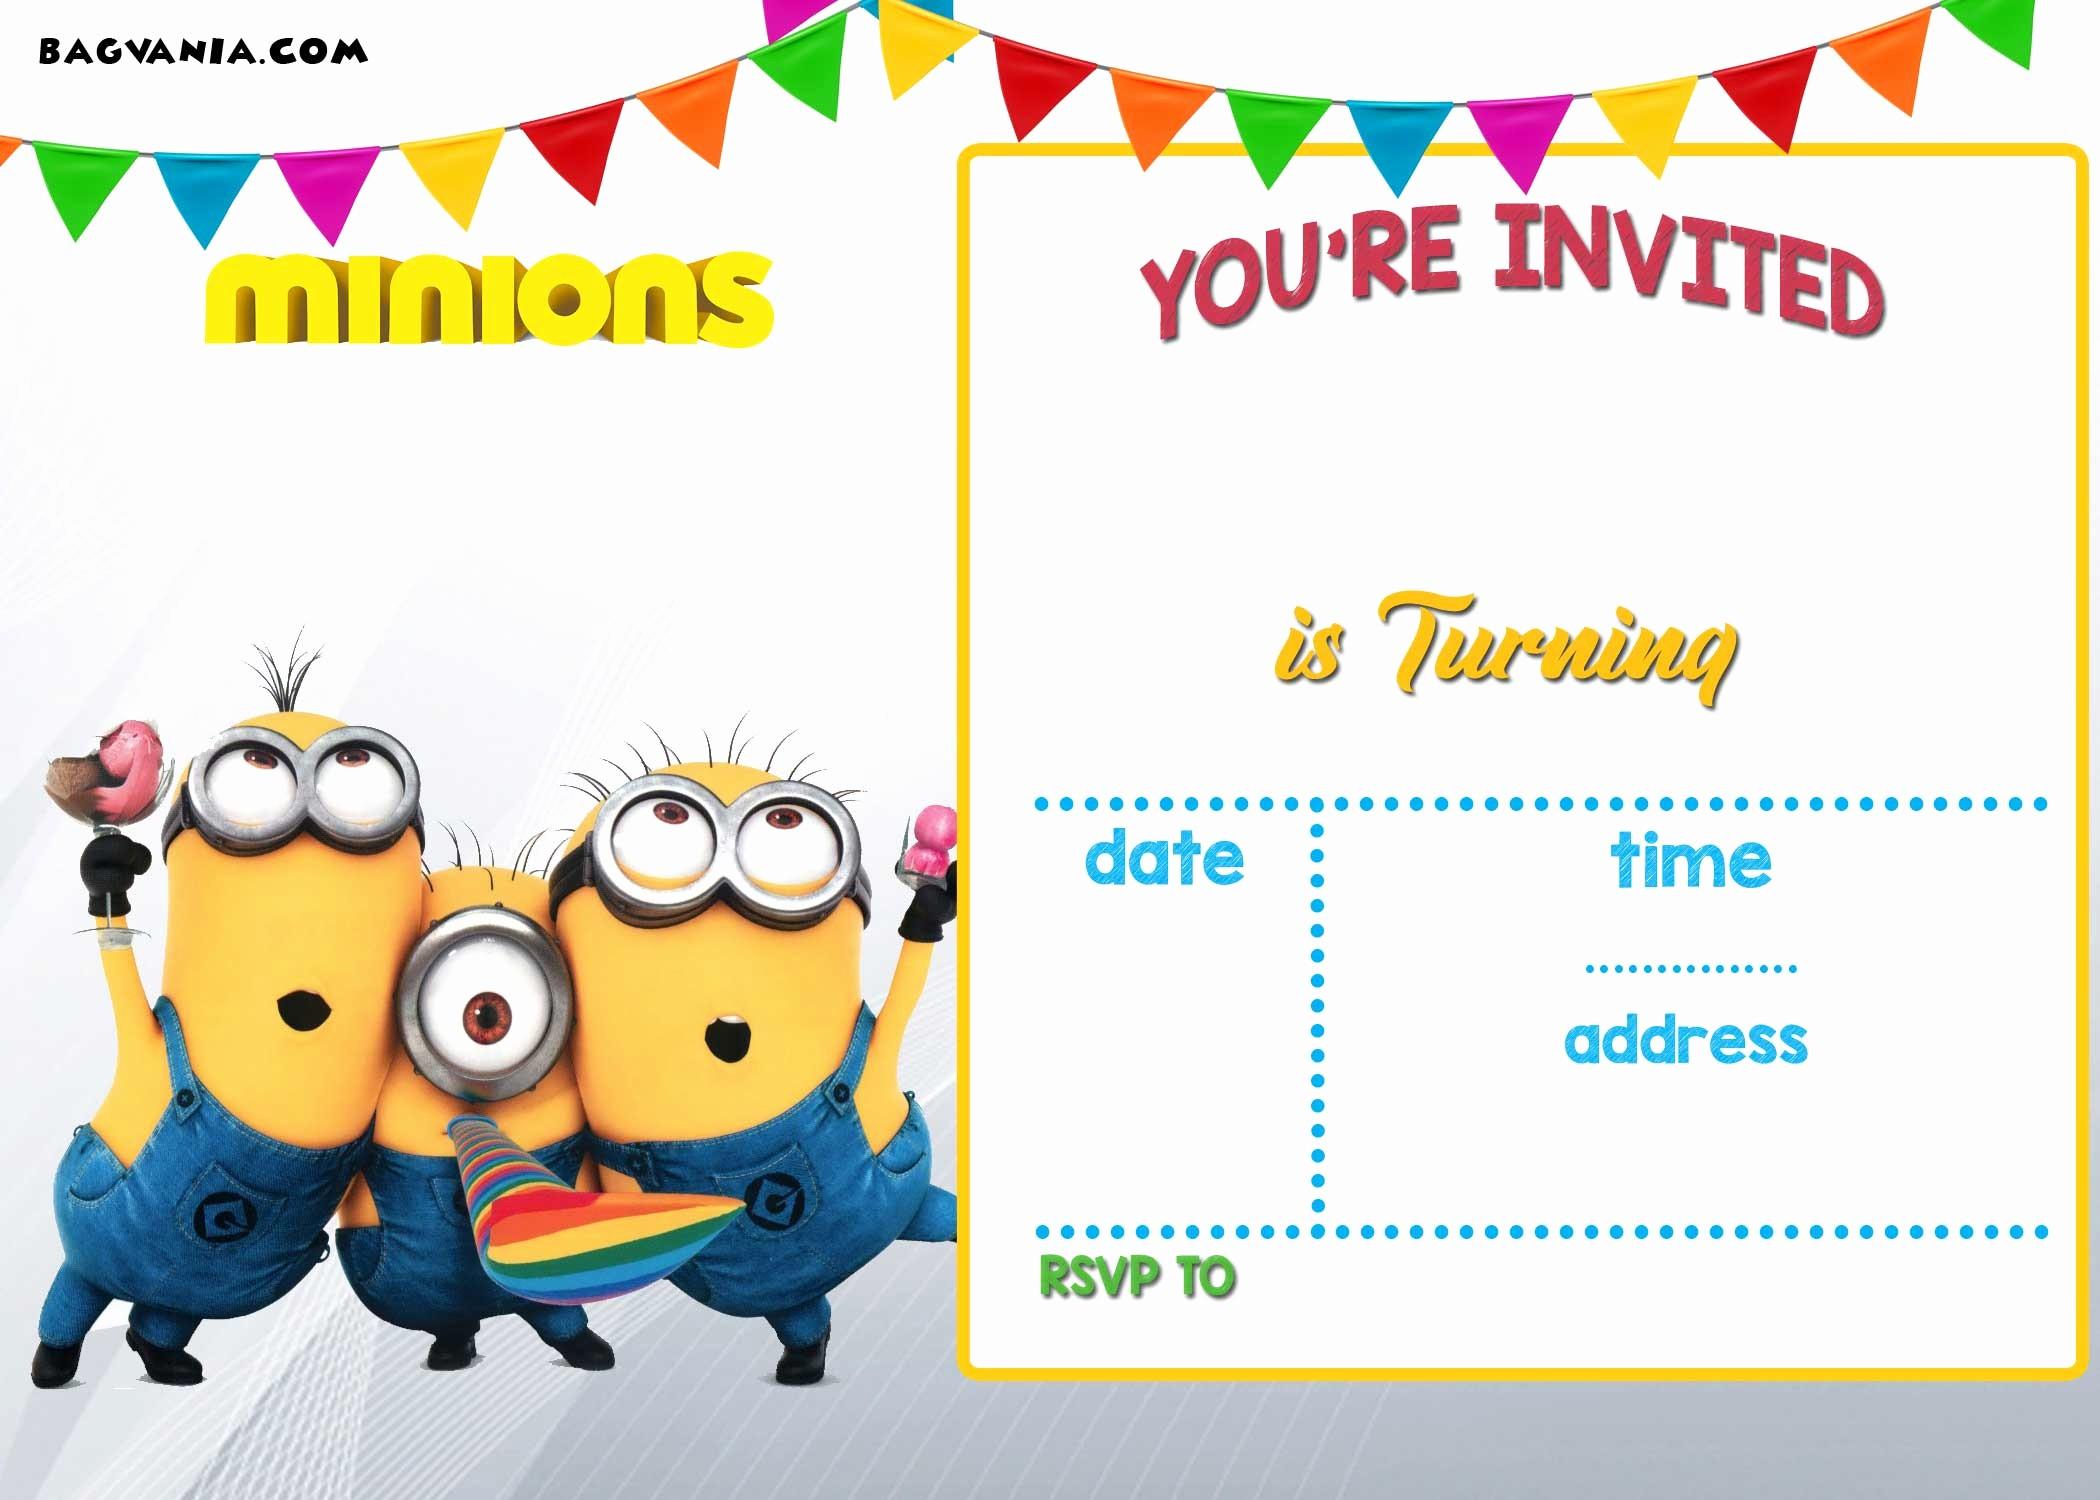 Invitation format for Birthday Party Unique Free Printable Minion Birthday Party Invitations Ideas